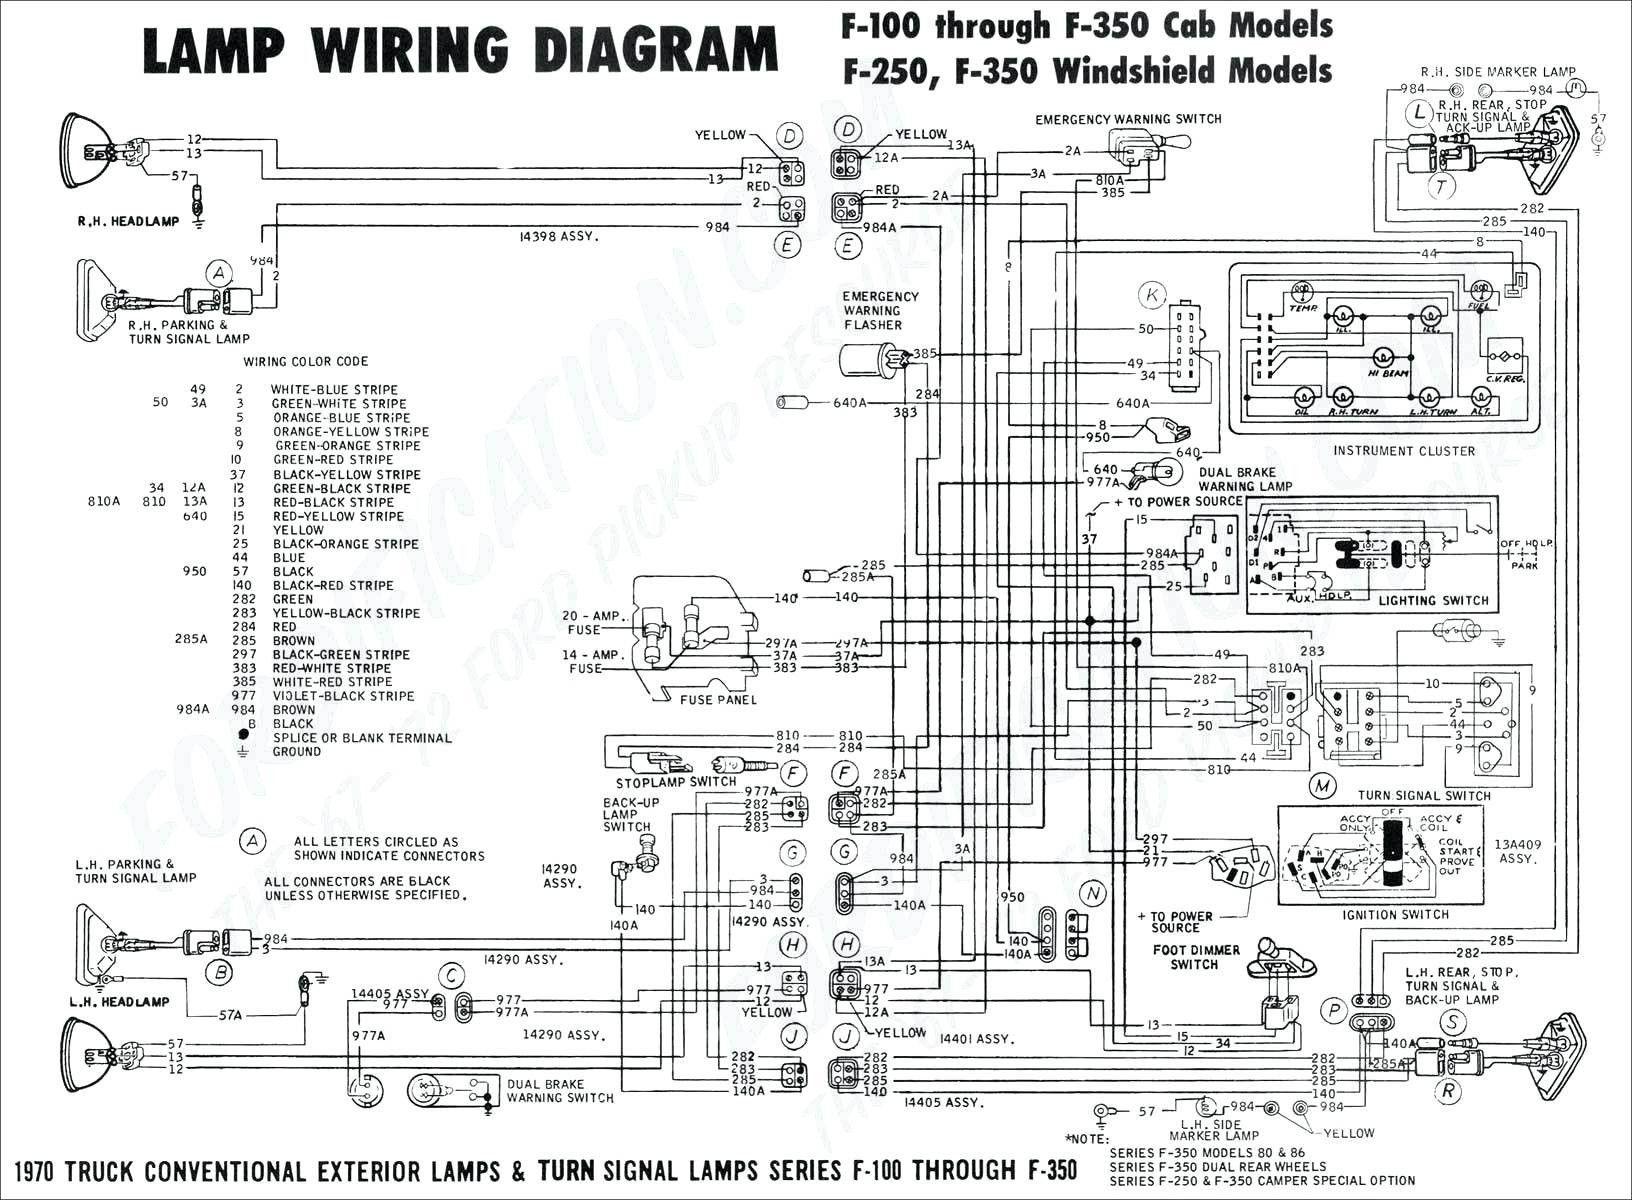 Unique Harley Radio Wiring Diagram In 2020 Electrical Wiring Diagram Diagram Trailer Wiring Diagram